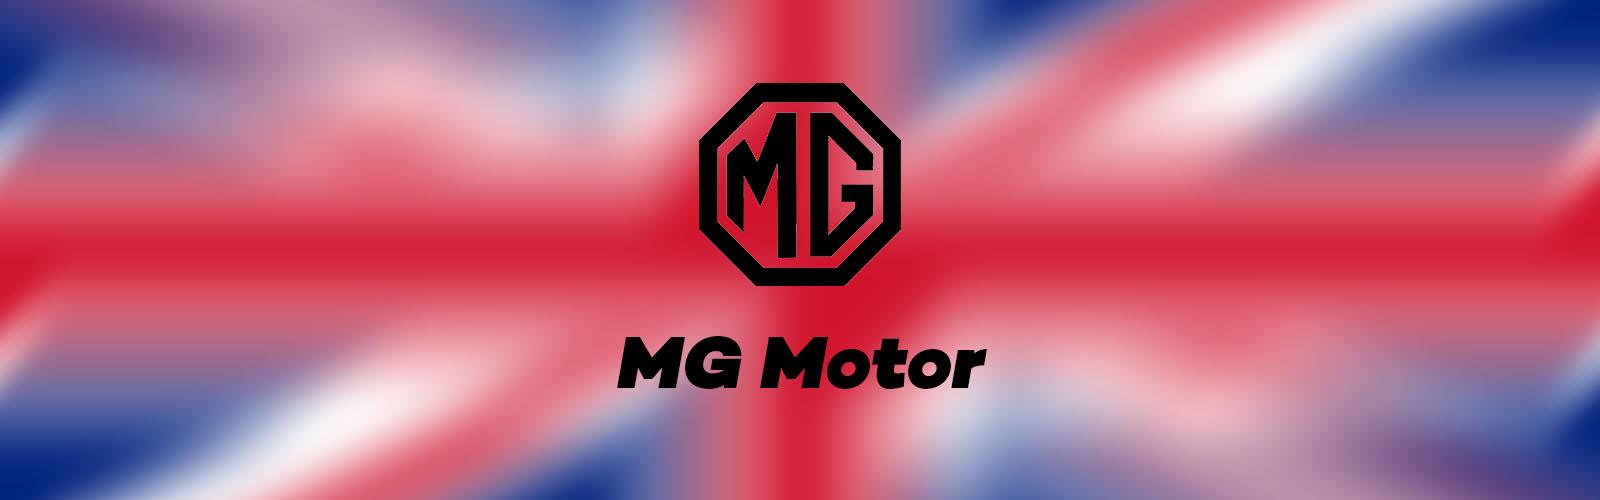 mg motor logo marque